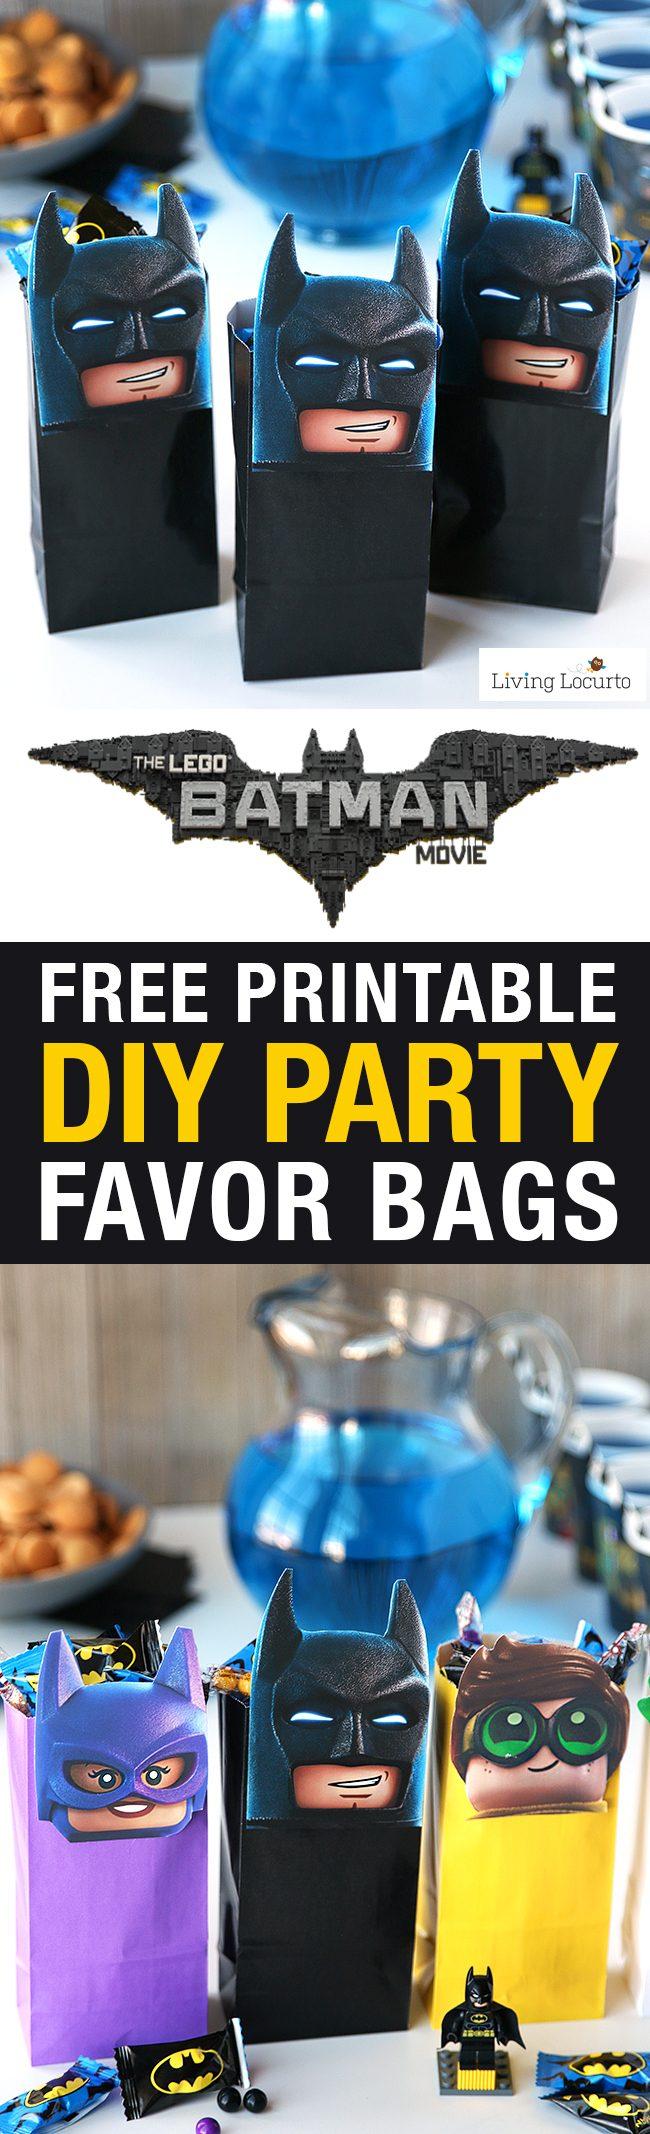 The Lego Batman Movie Diy Party Treat Bags | Free Printable Favor Bags - Free Printable Lego Batman